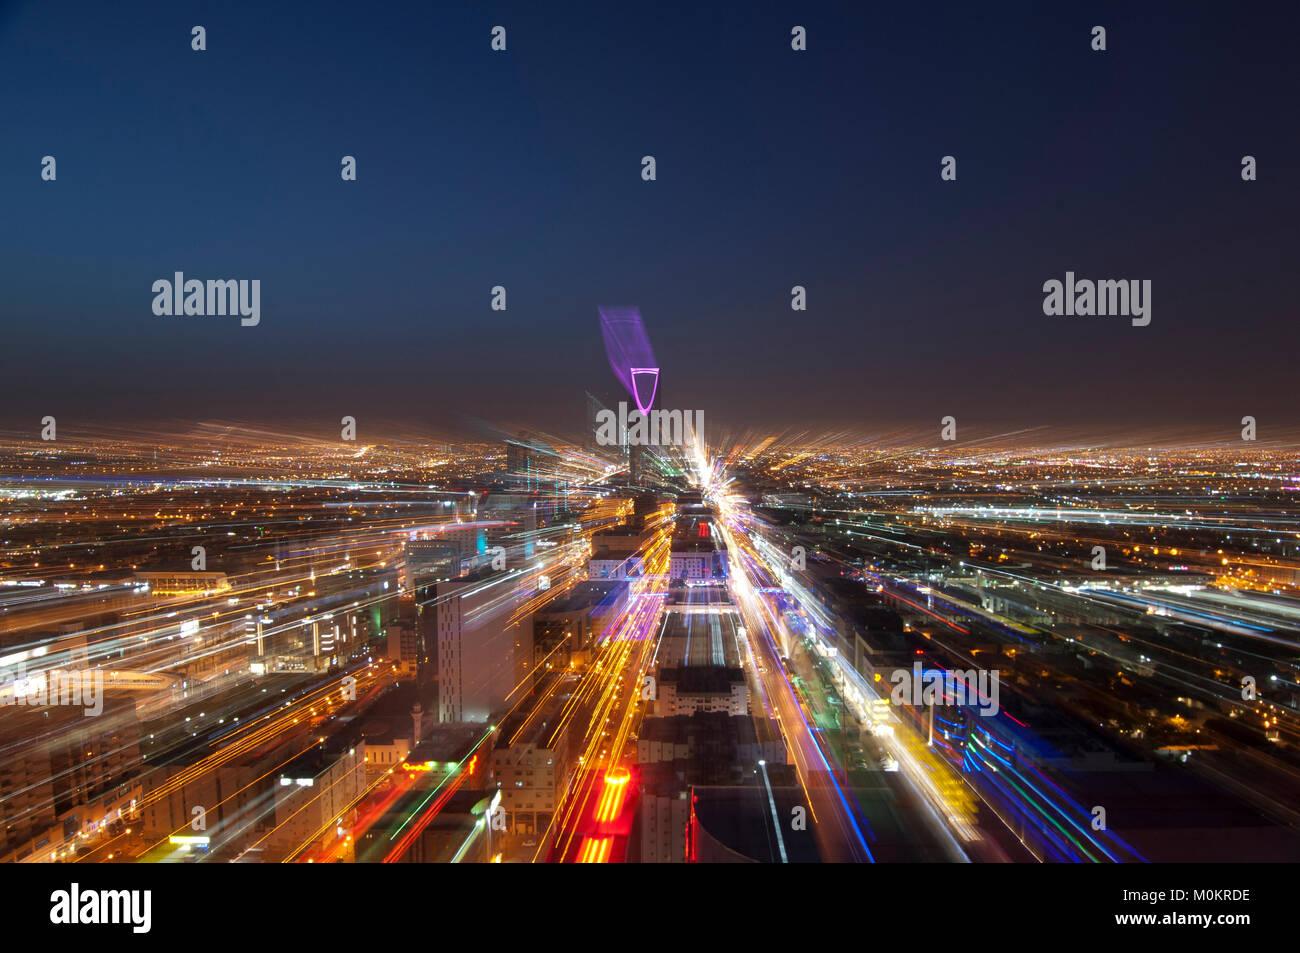 Riyadh skyline at night #6 - Stock Image